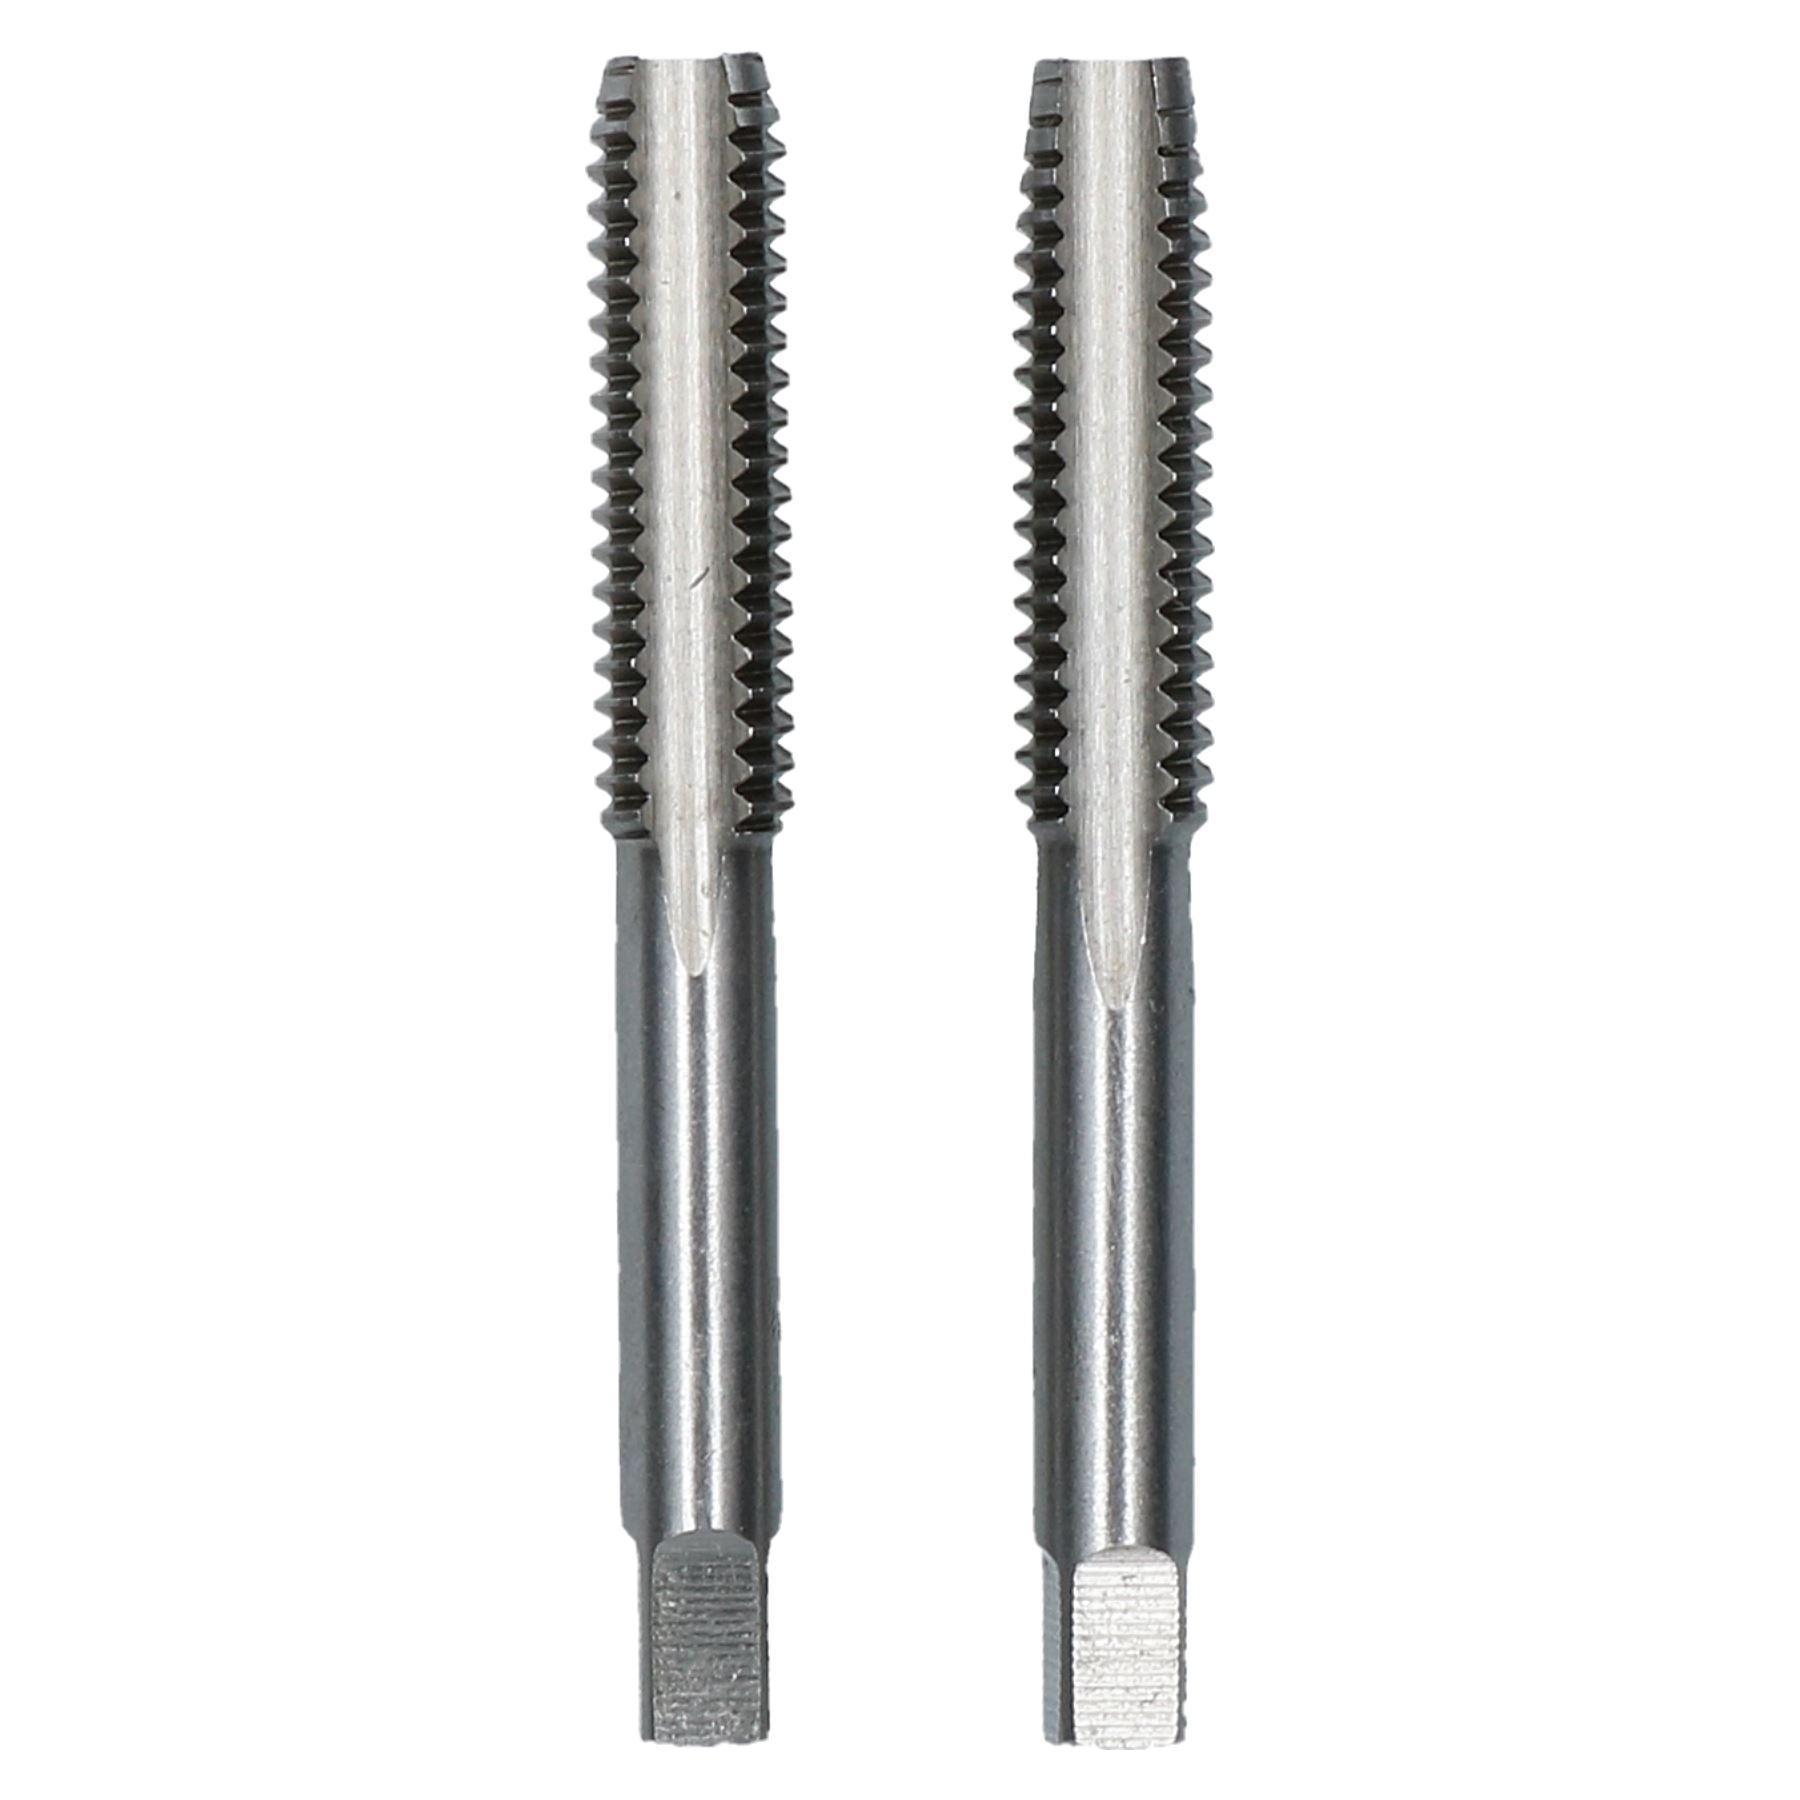 M12 M14 M16 M18 M20 metric HSS thread die hand tap pitch 1.5mm high quality X ZV